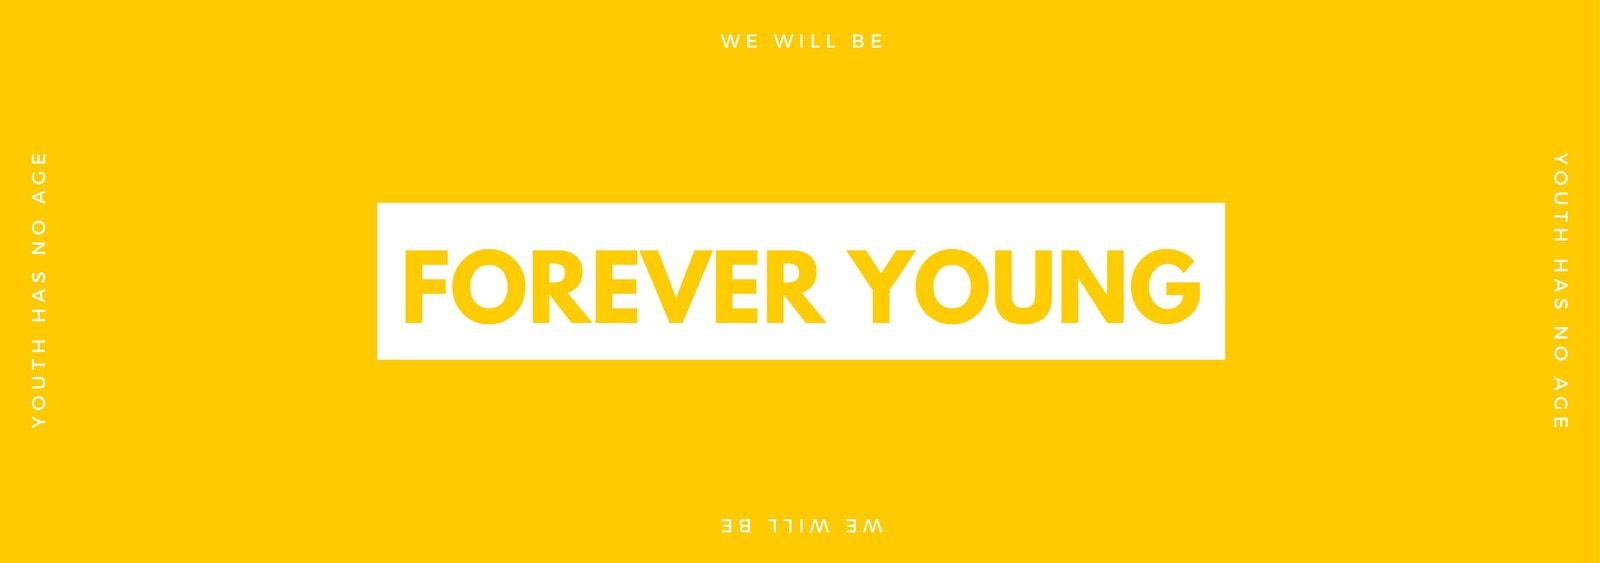 Bright Colored Tumblr Banner